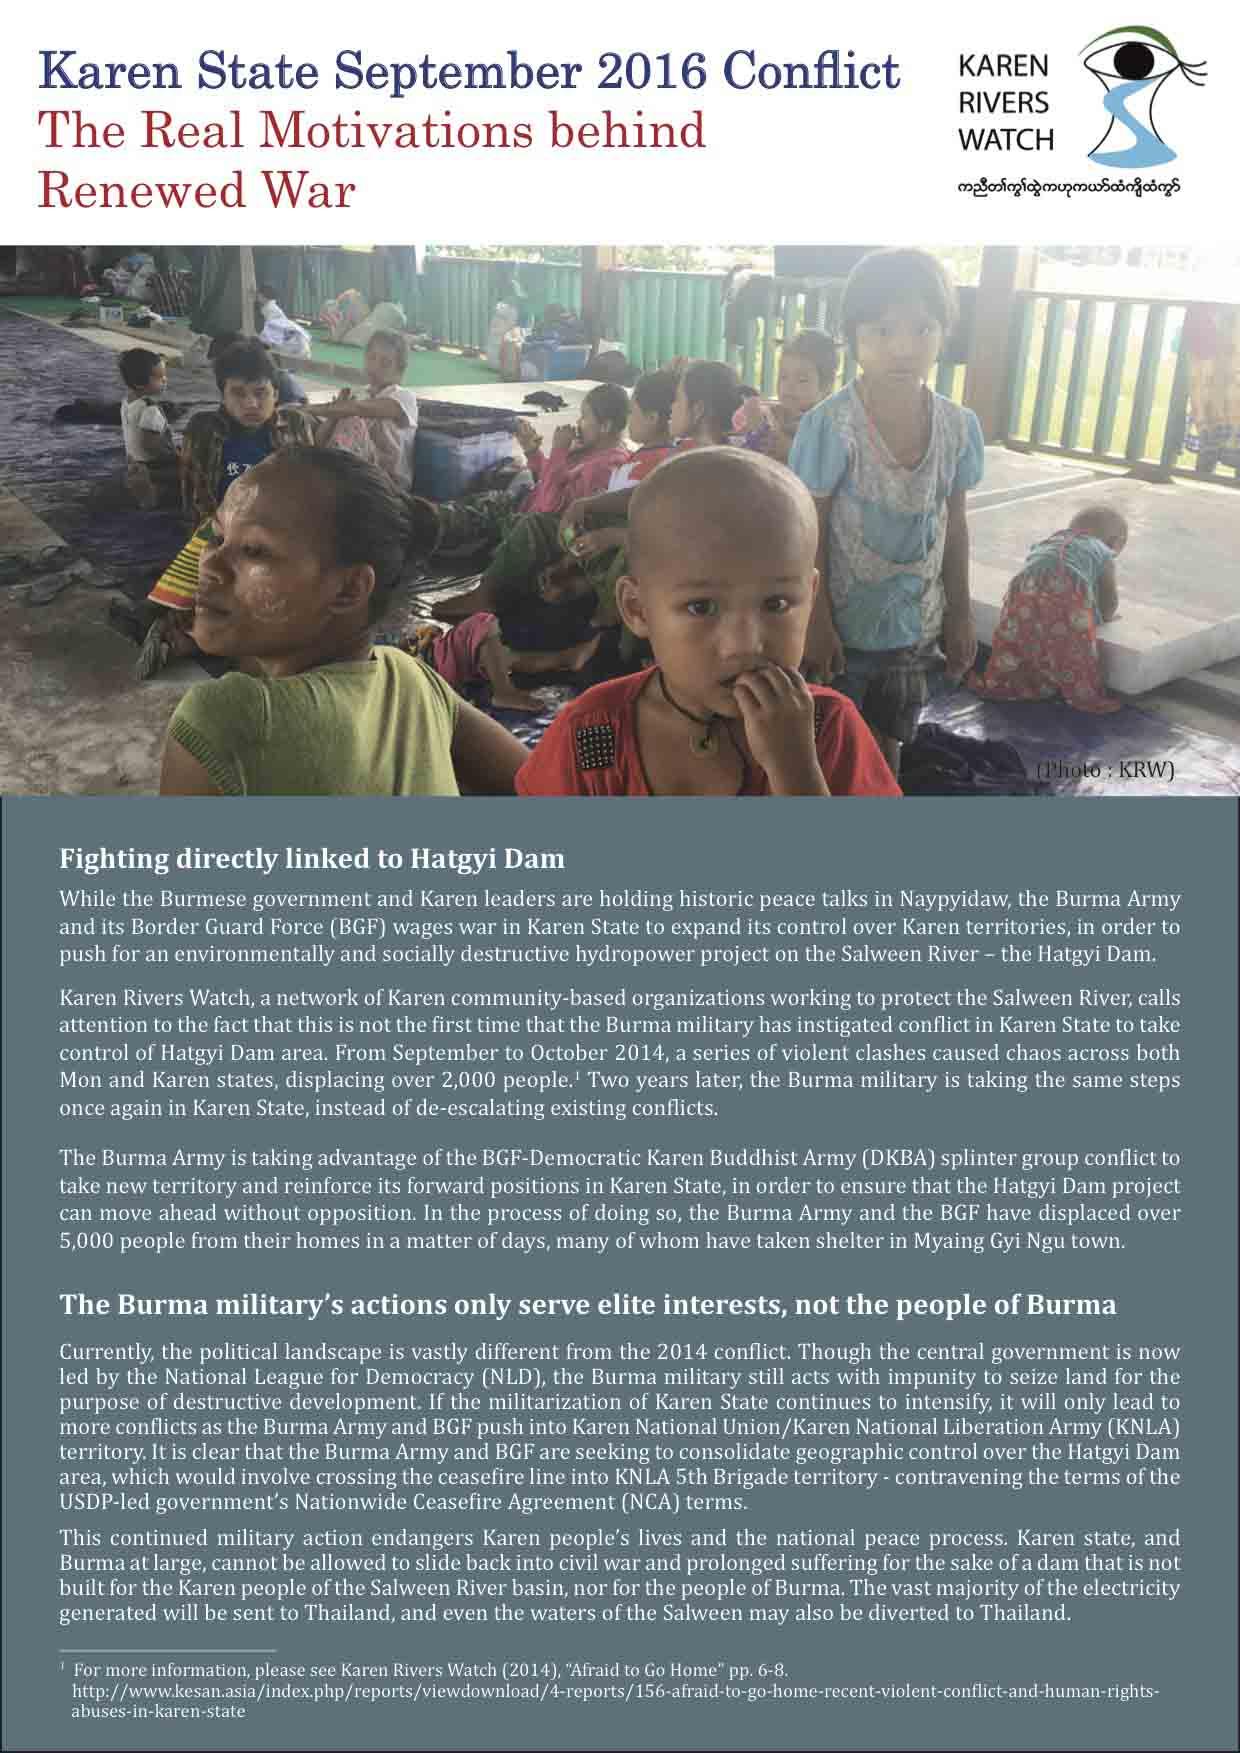 karen-state-september-2016-conflict-the-real-motivations-behind-renewed-war